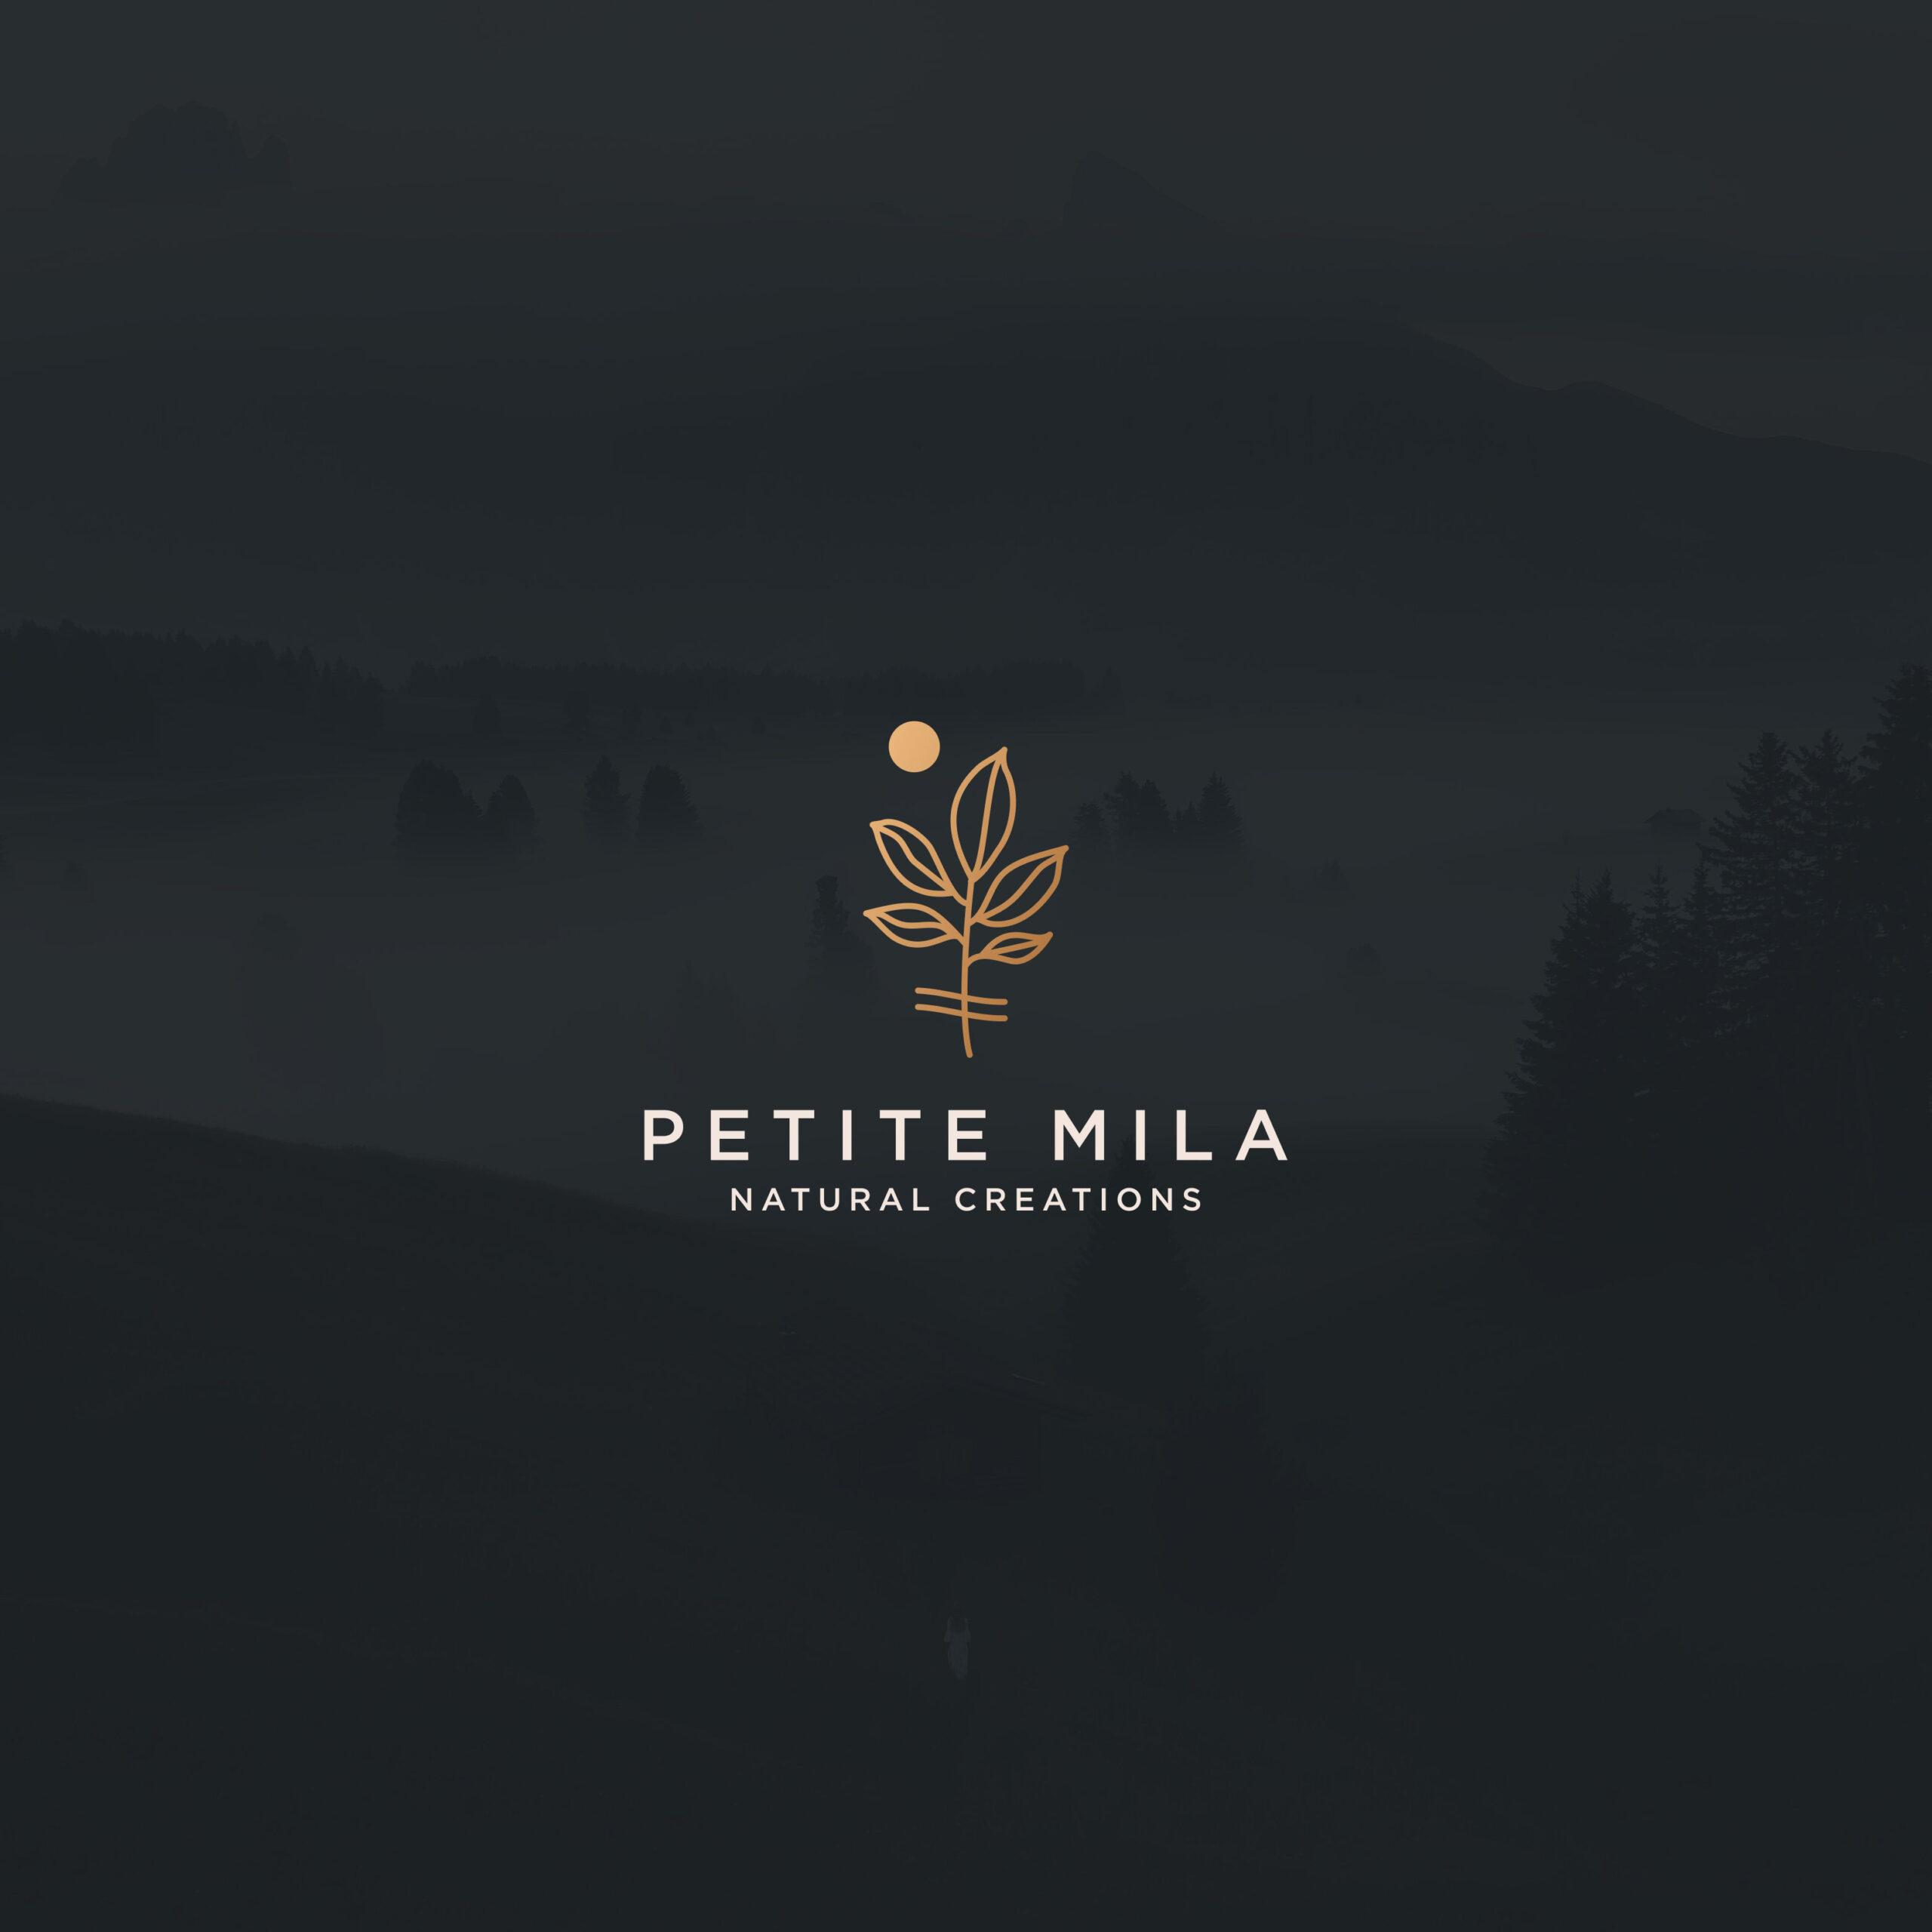 PETITE-MILA-IG-1